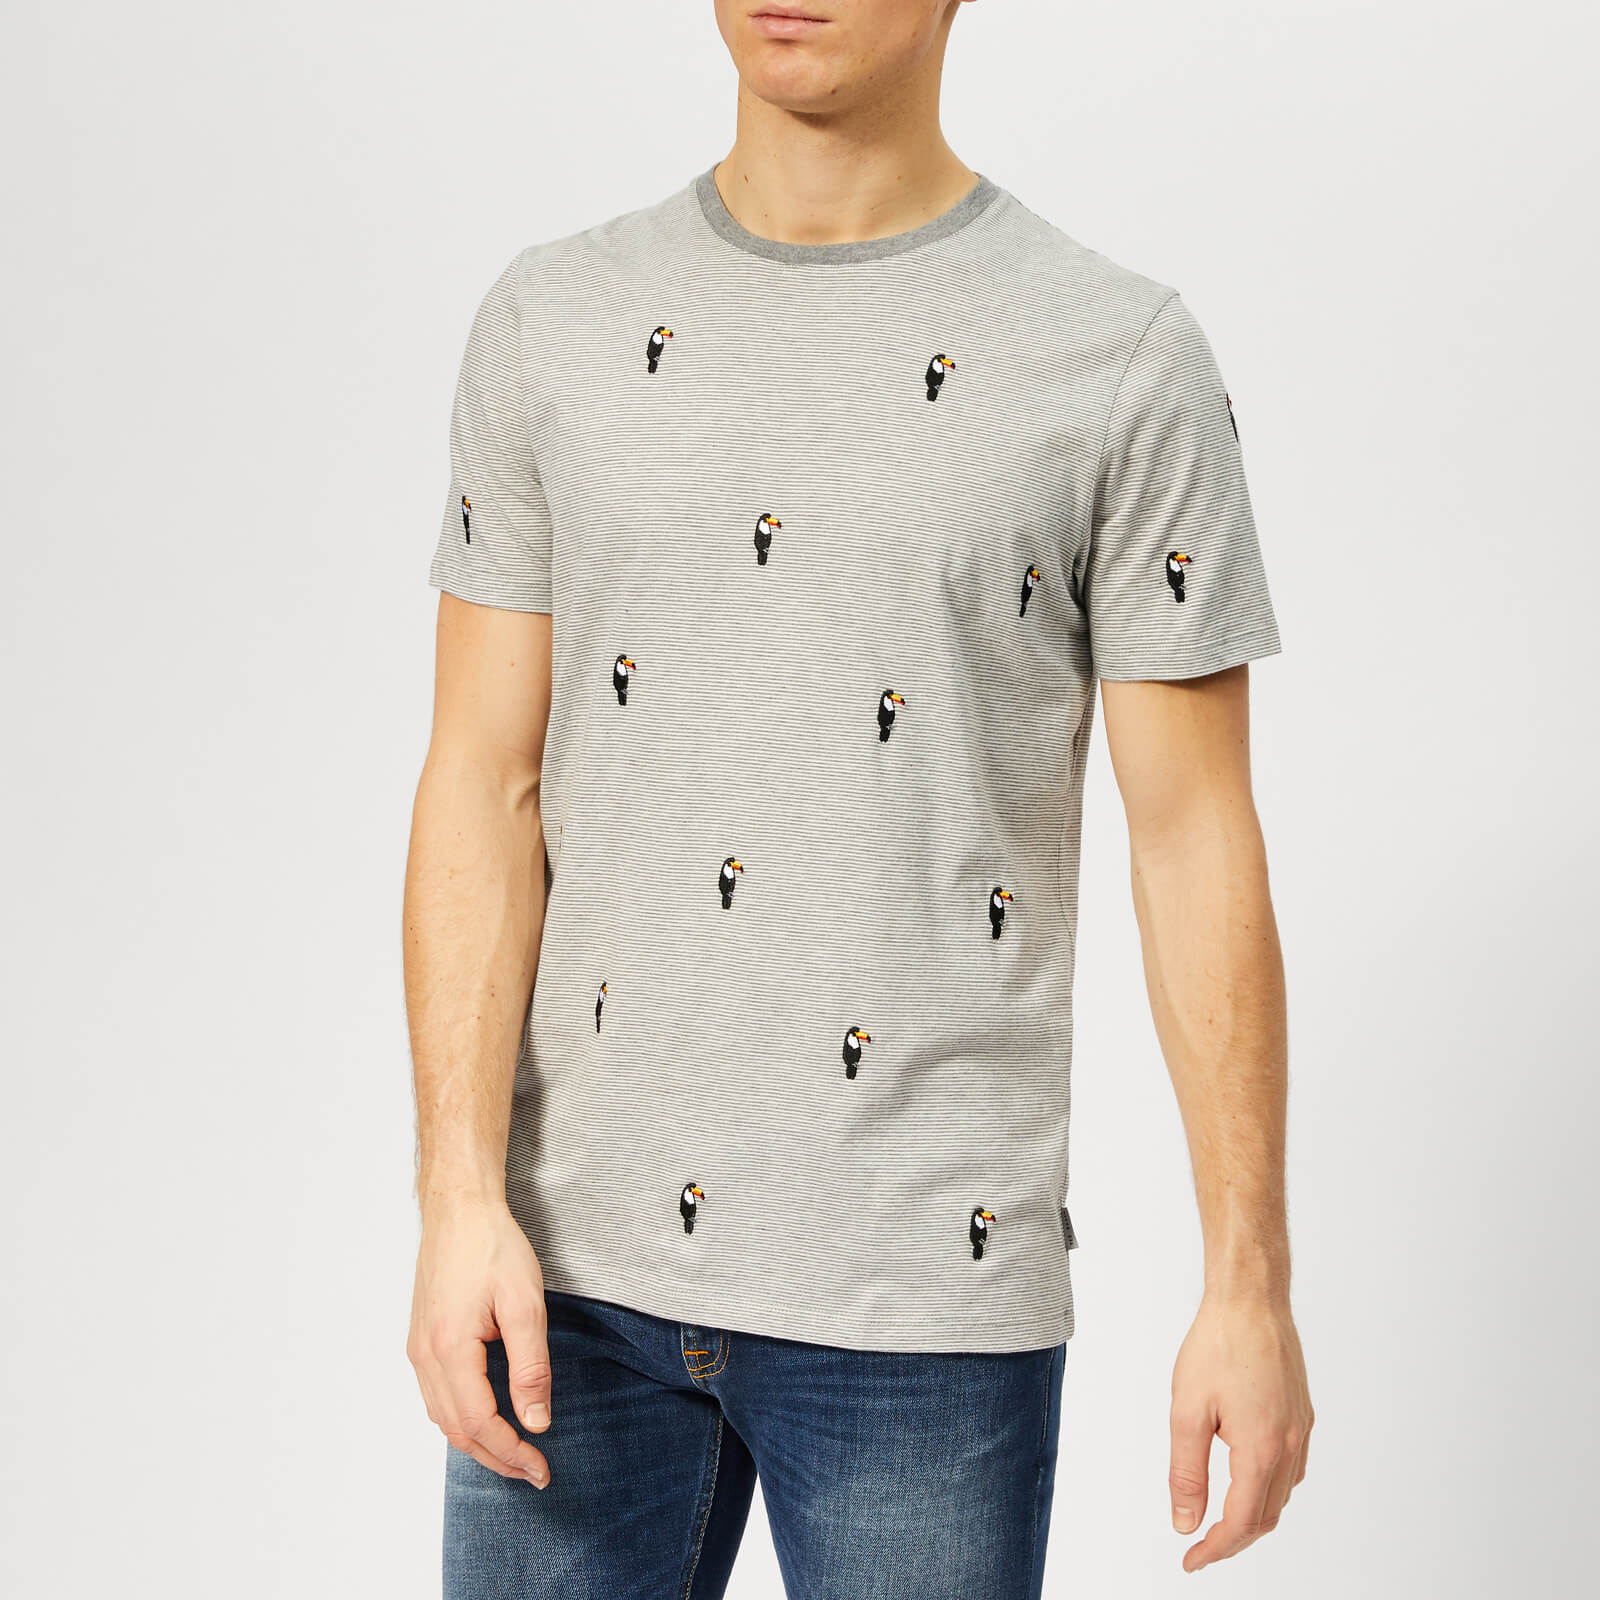 4254b59ba Ted Baker Men s Vipa T-Shirt - Grey-Marl Clothing